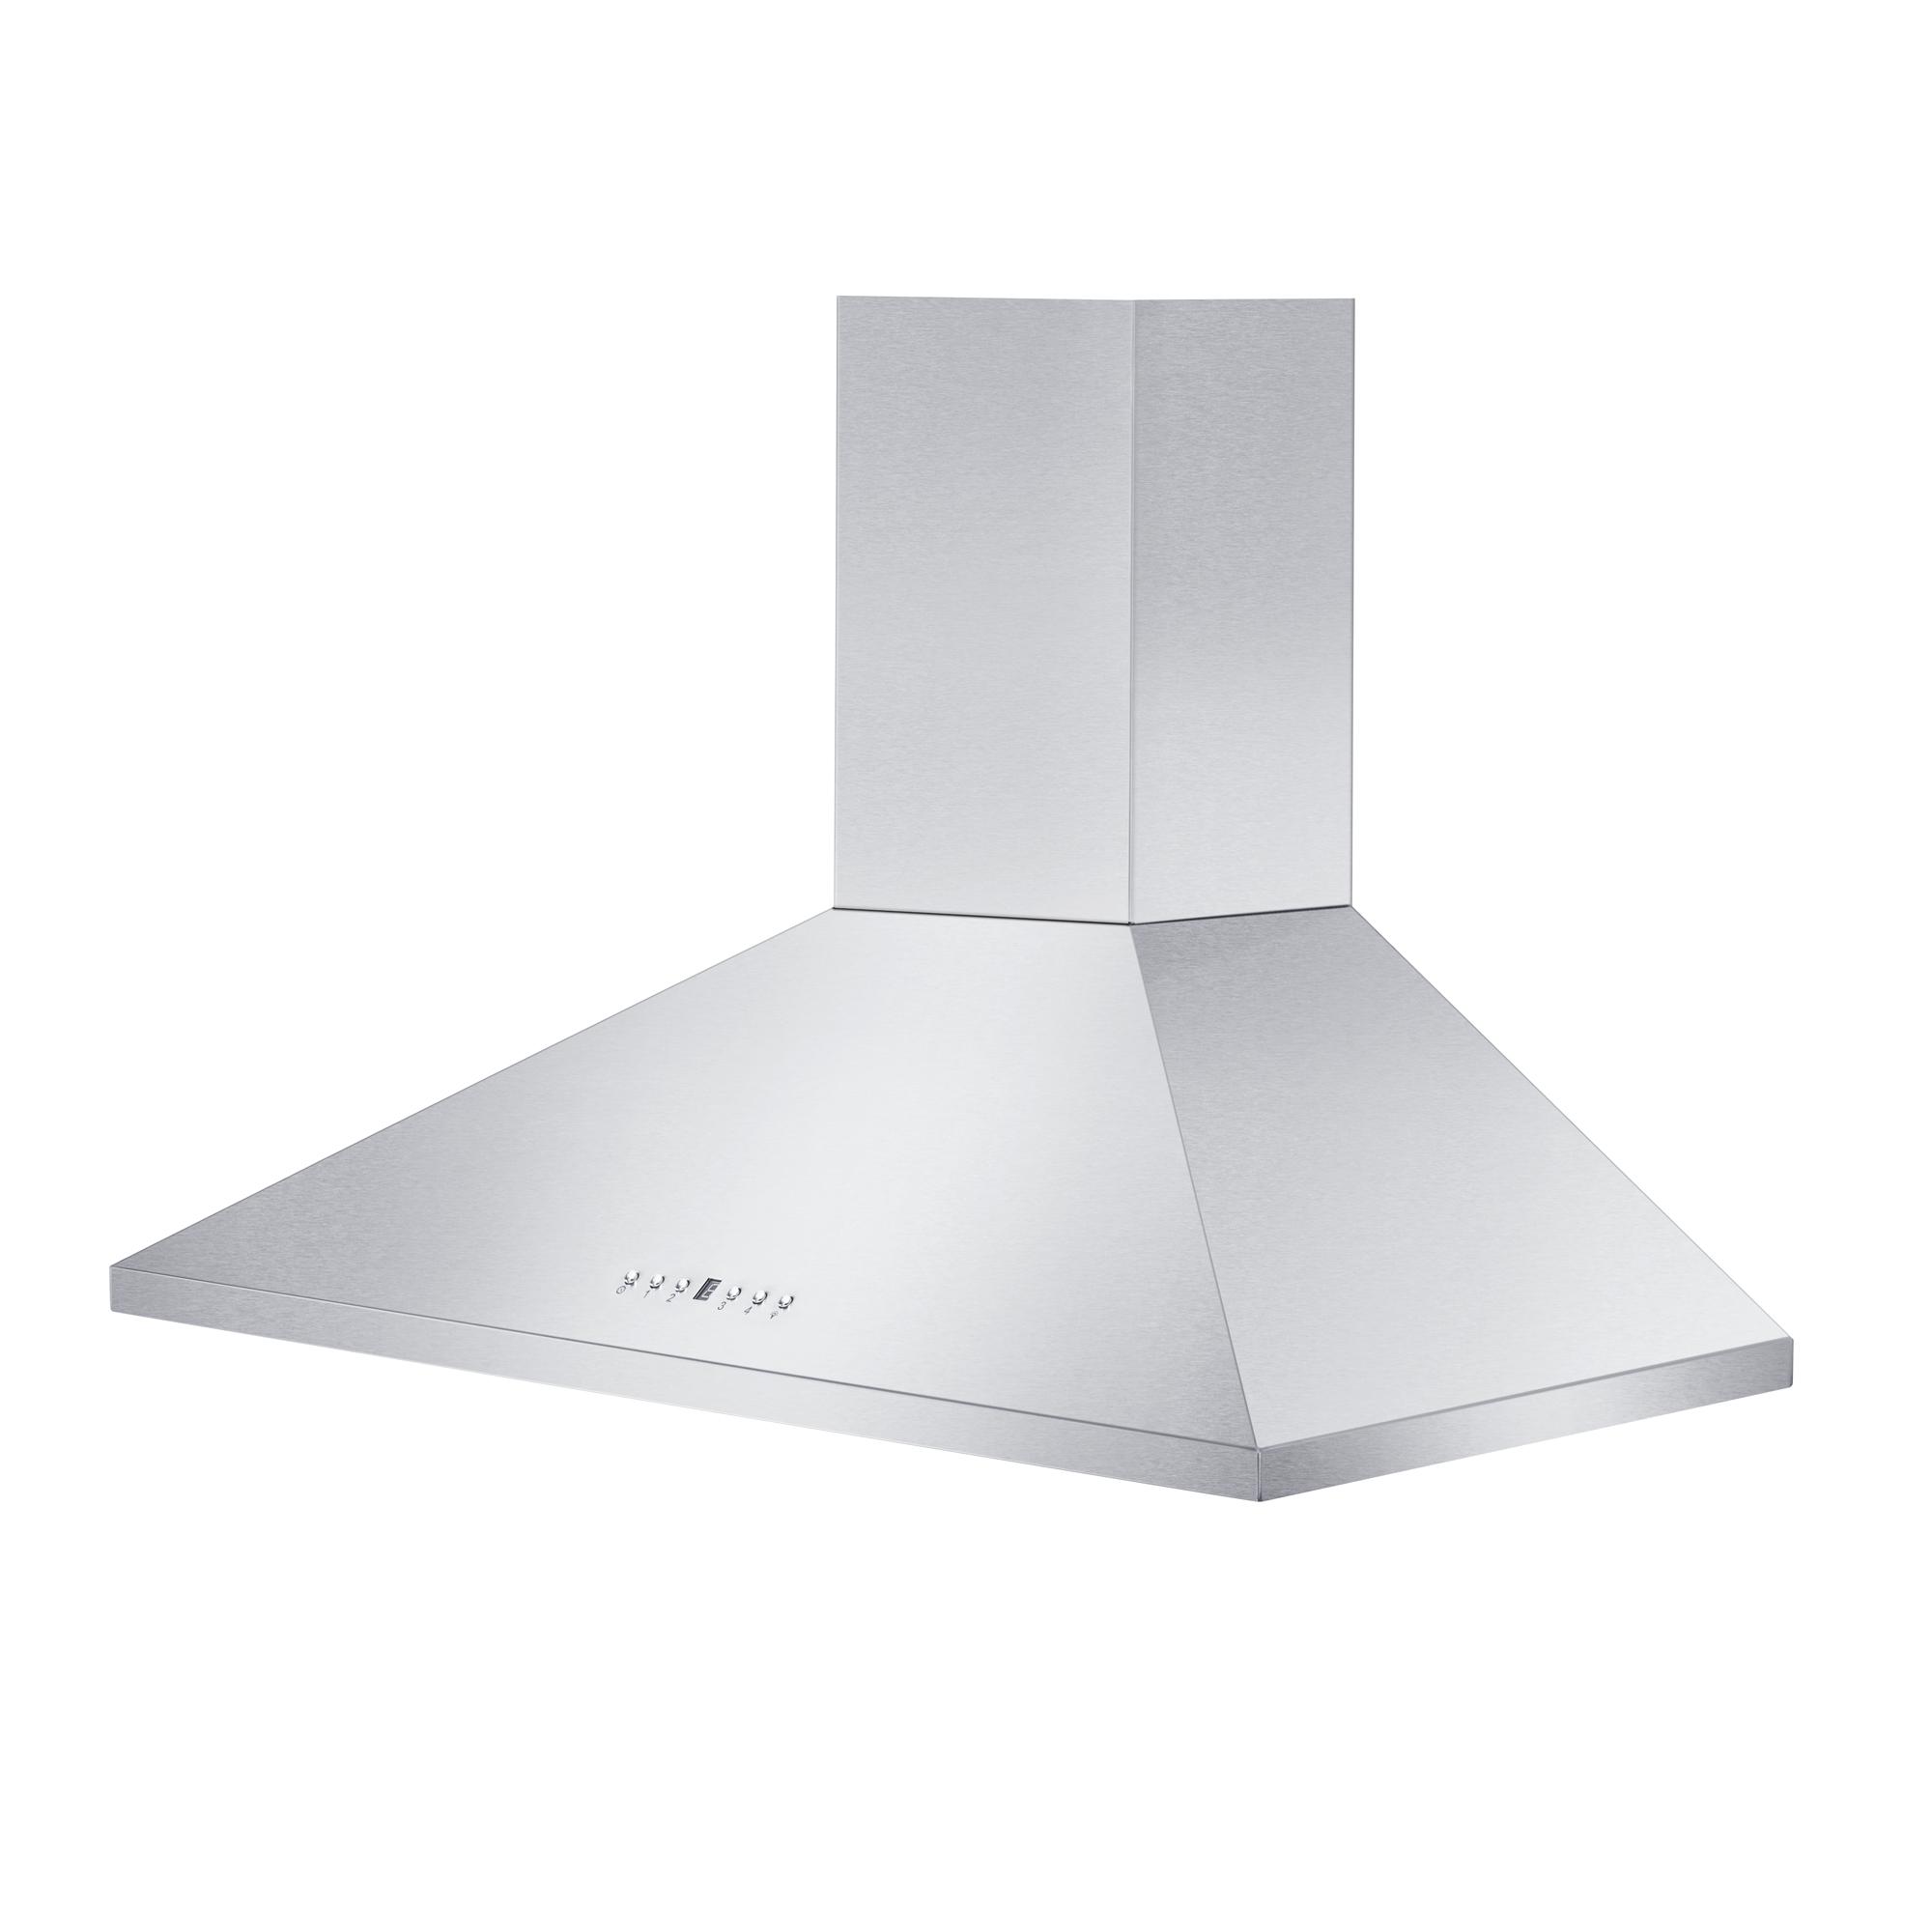 zline-stainless-steel-wall-mounted-range-hood-KL2-new-main.jpg